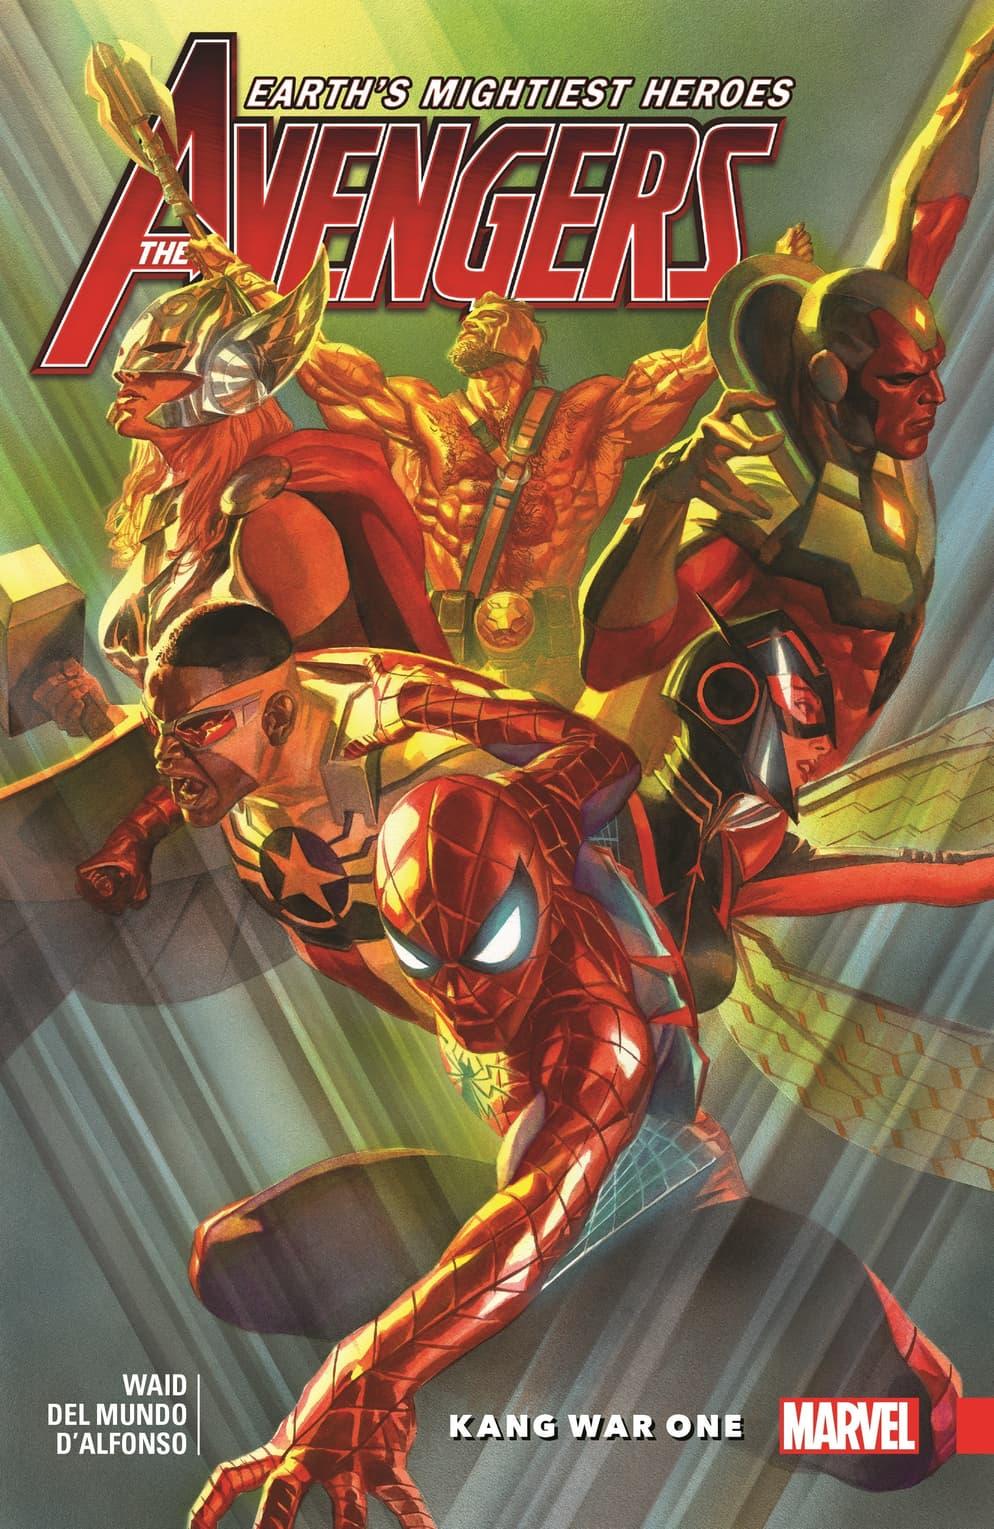 The Avengers versus Kang.